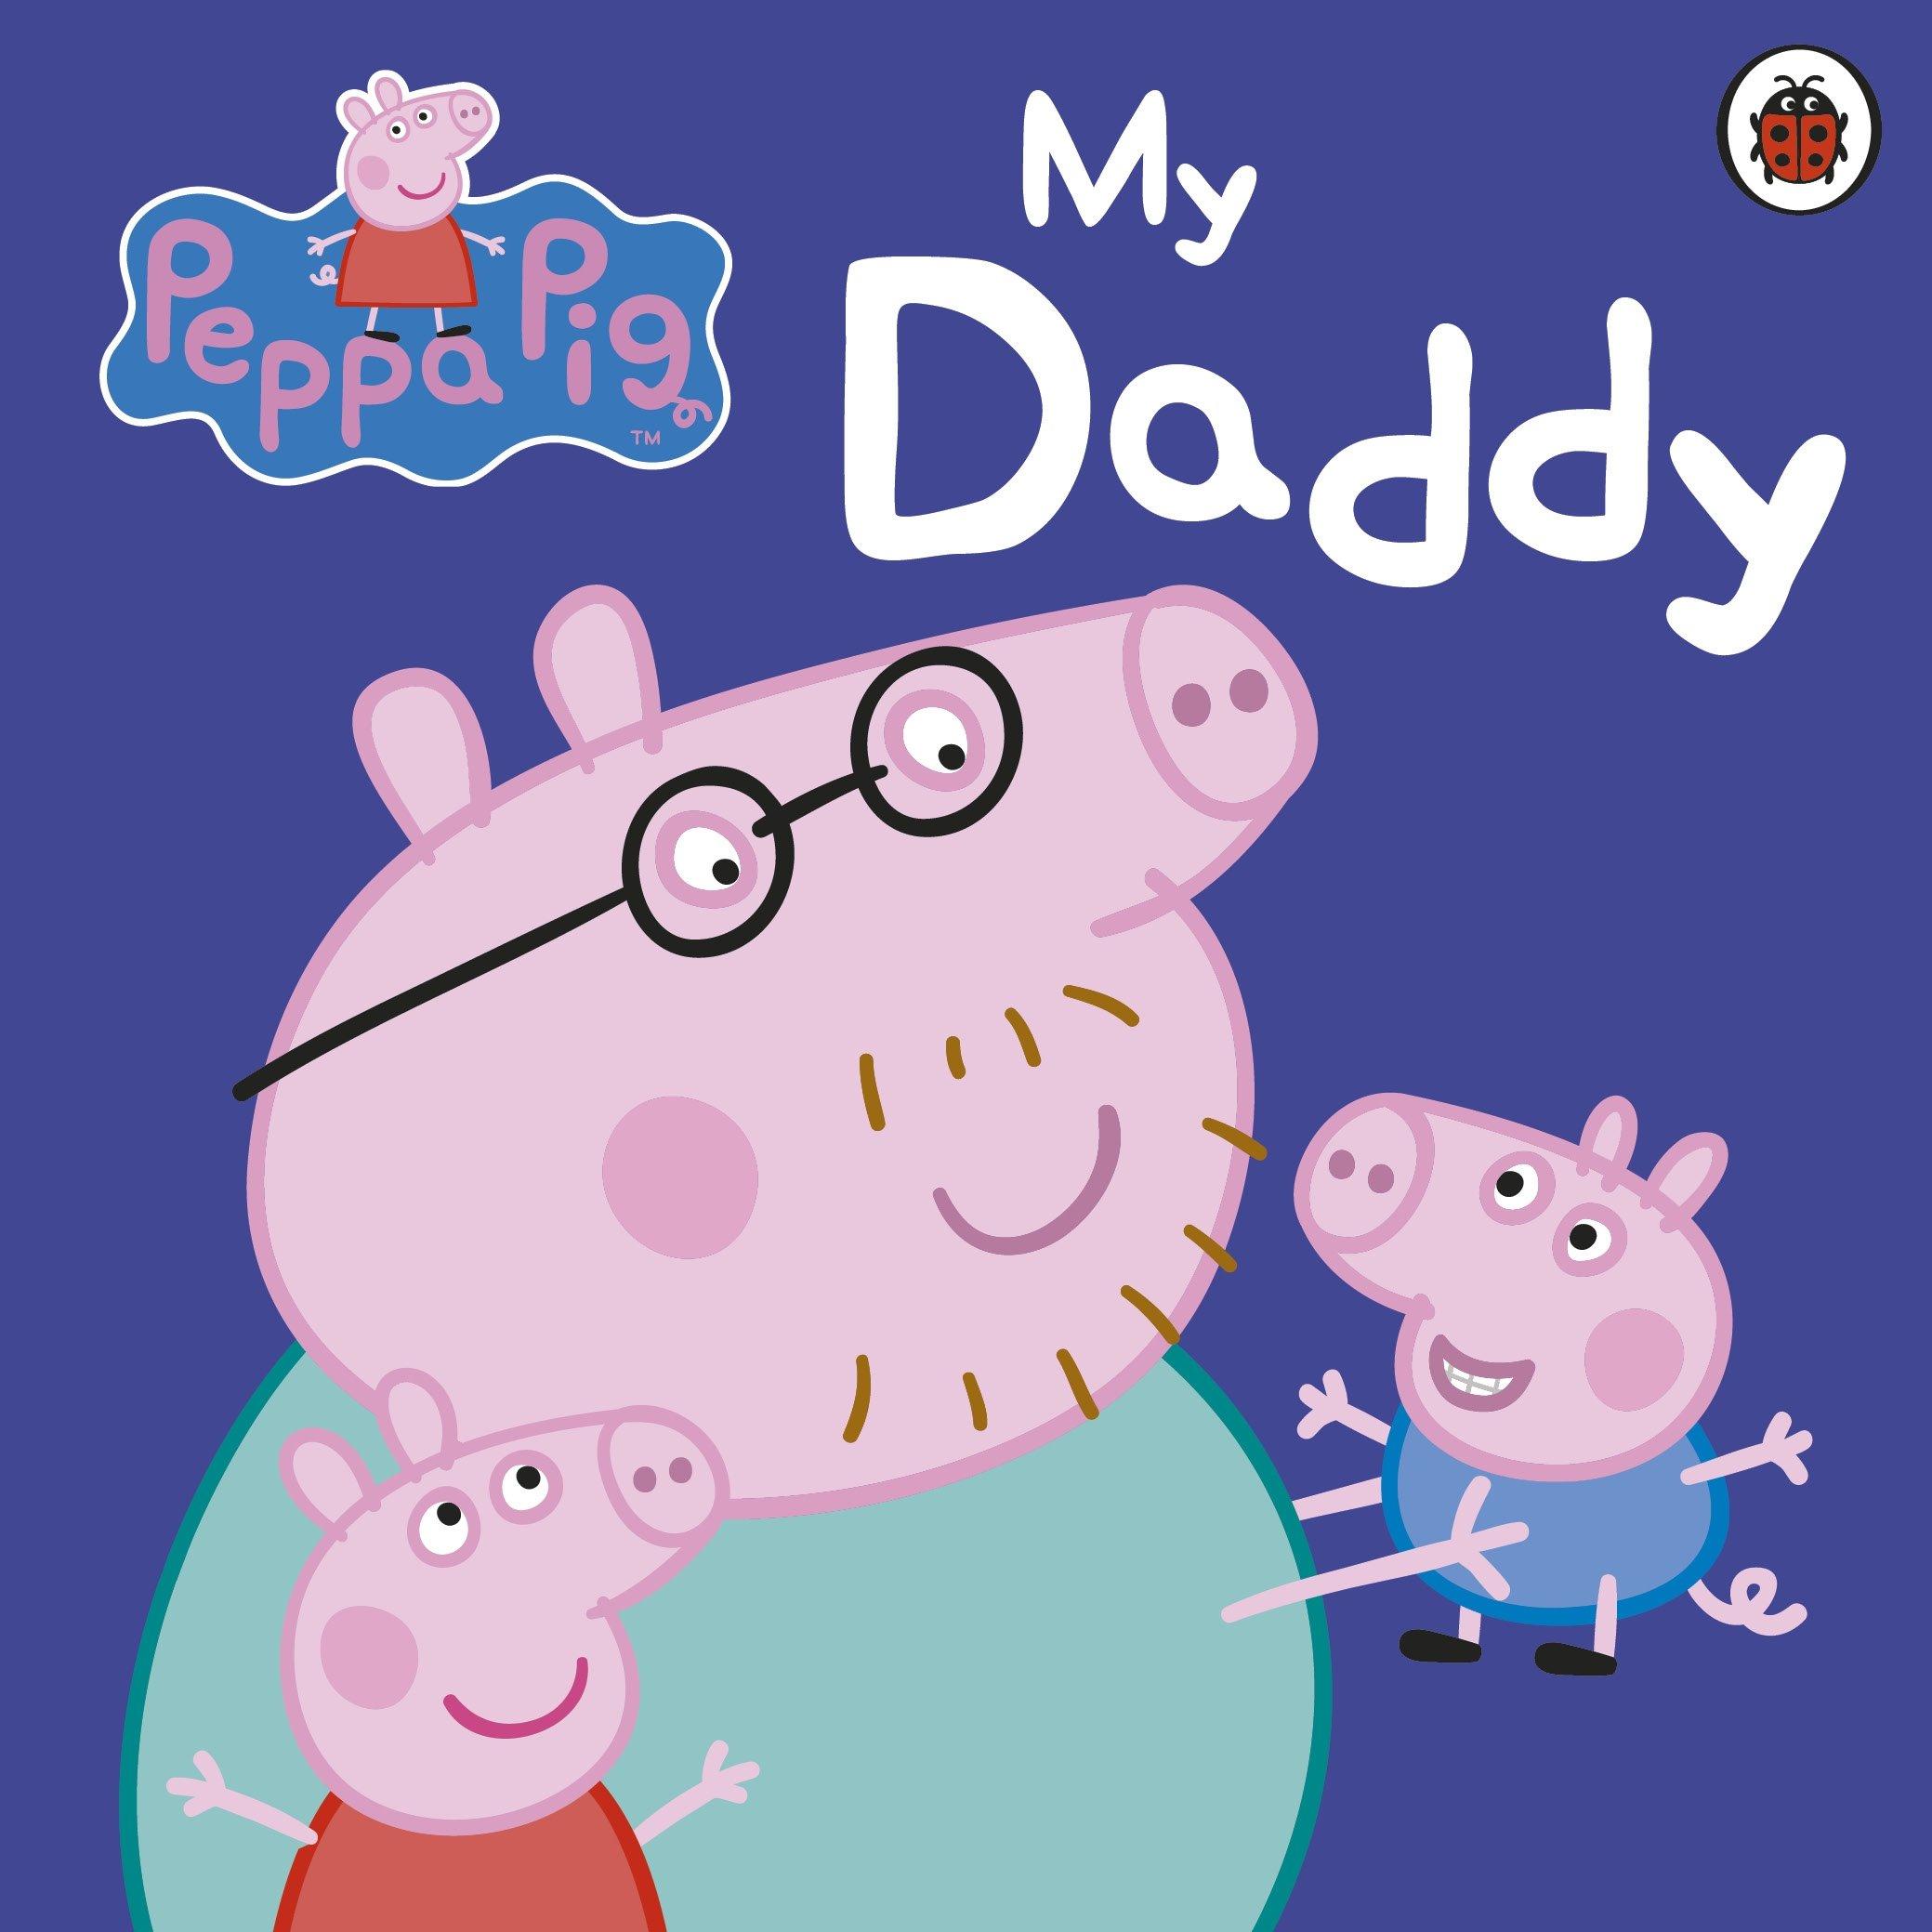 My Daddy Peppa Pig 8601411084171 Amazon Books